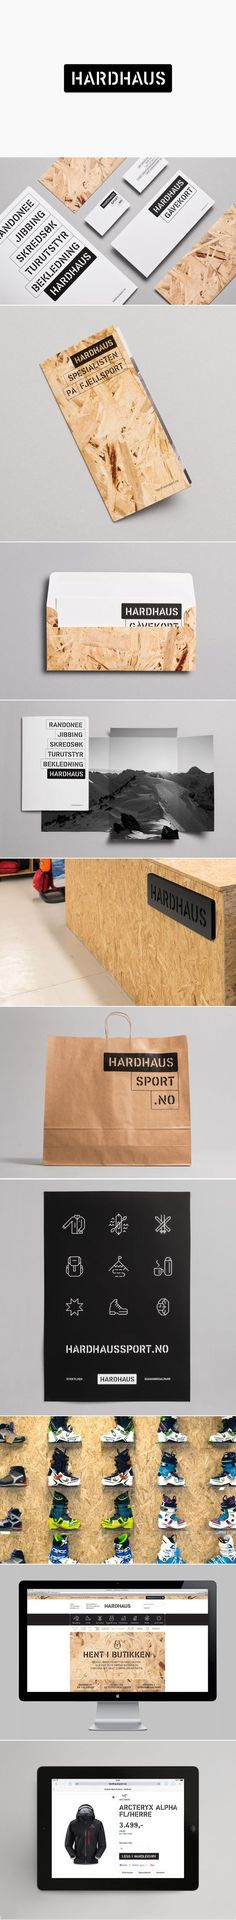 Hardhaus Sports Logo & Brand Identity Design.